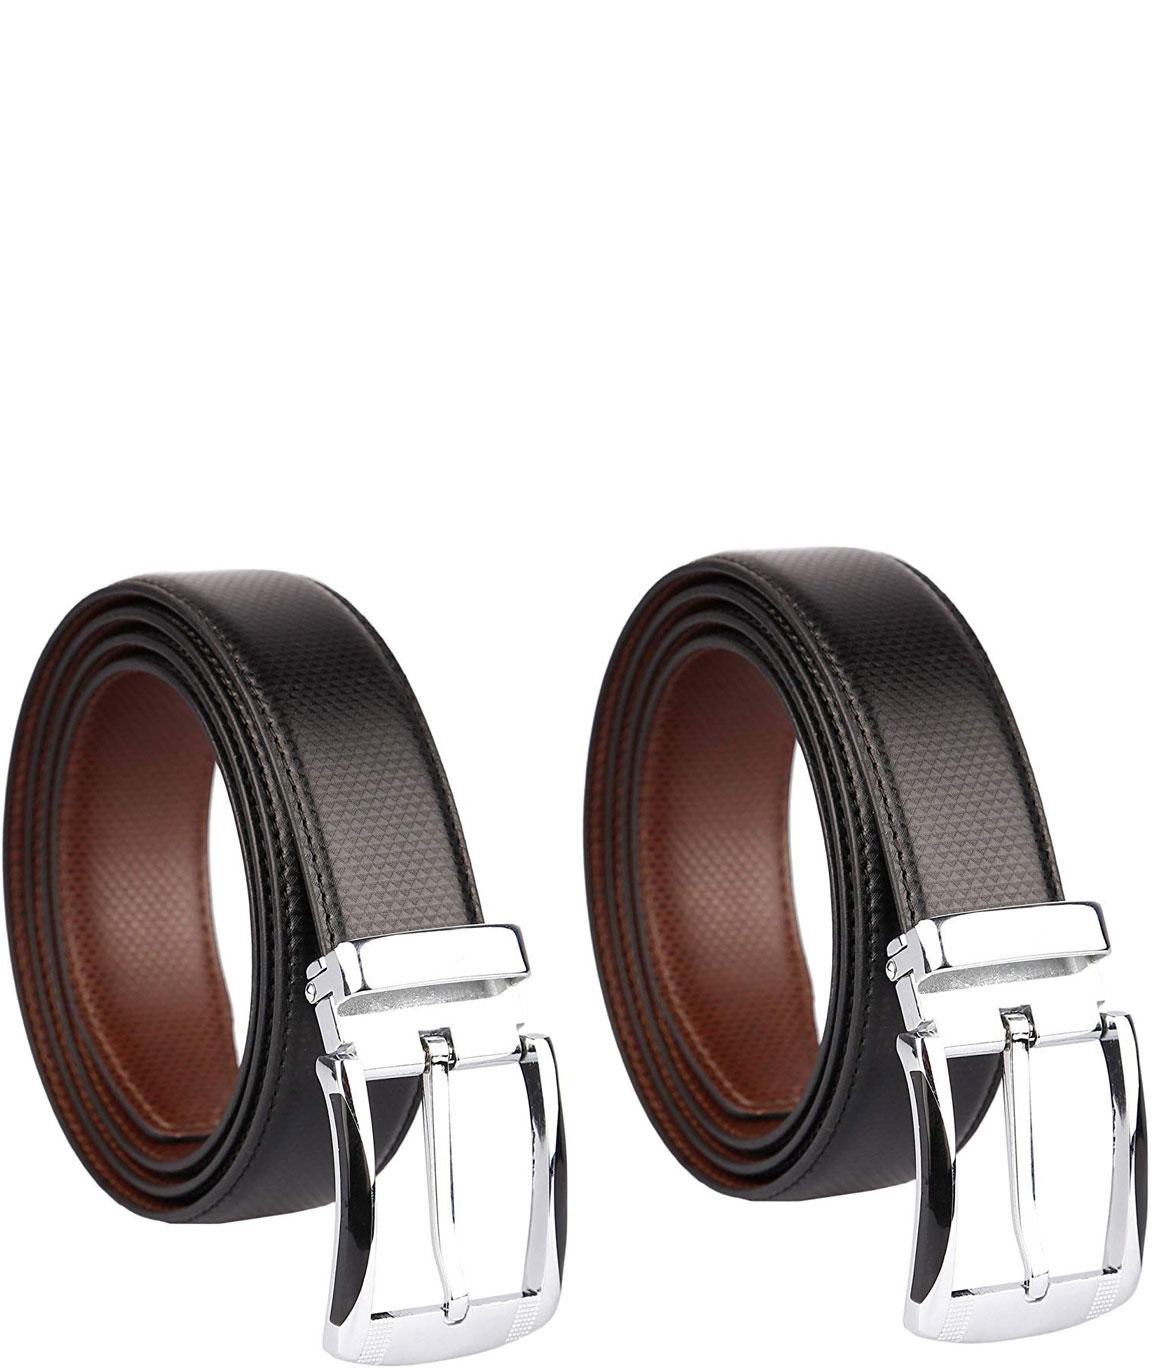 Alfami Mens Leather Reversible belts (Pack of 2) BlackBrown